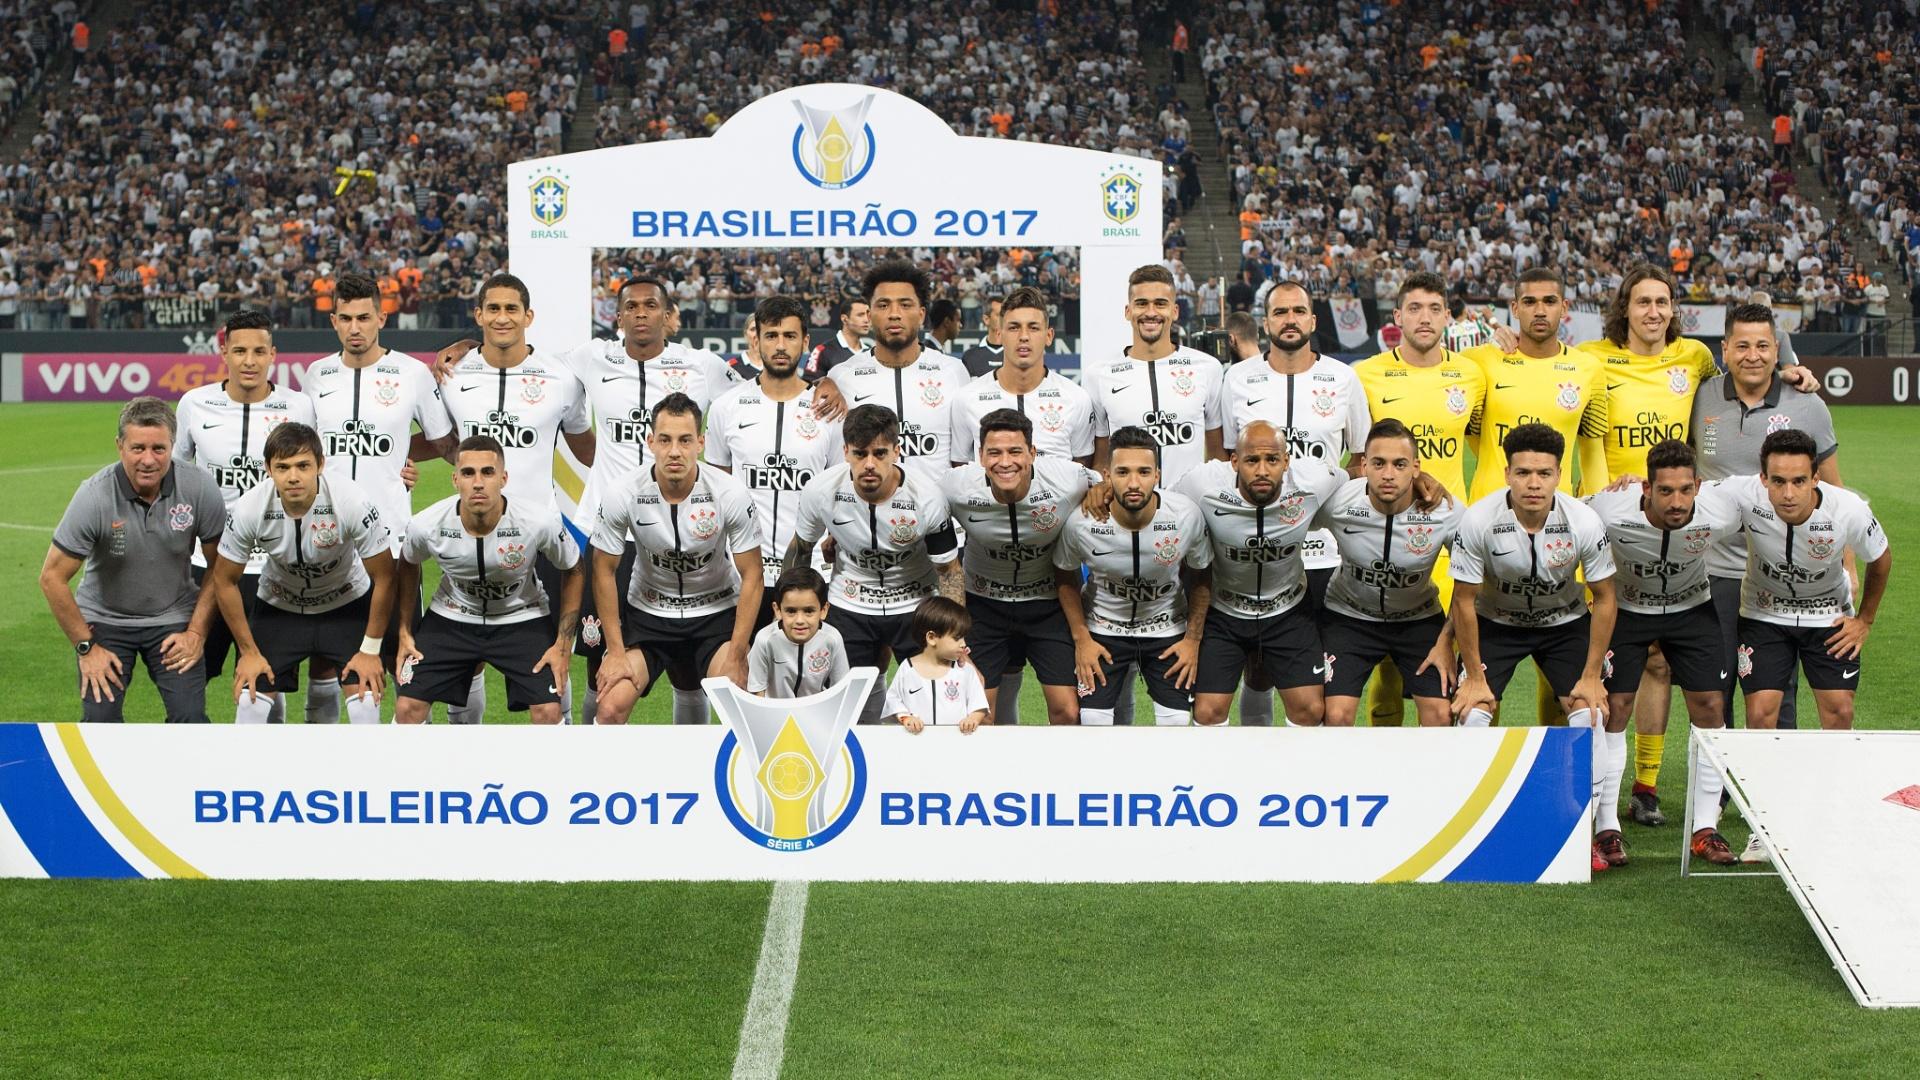 Elenco do Corinthians perfilado para jogo contra o Fluminense pelo Campeonato Brasileiro